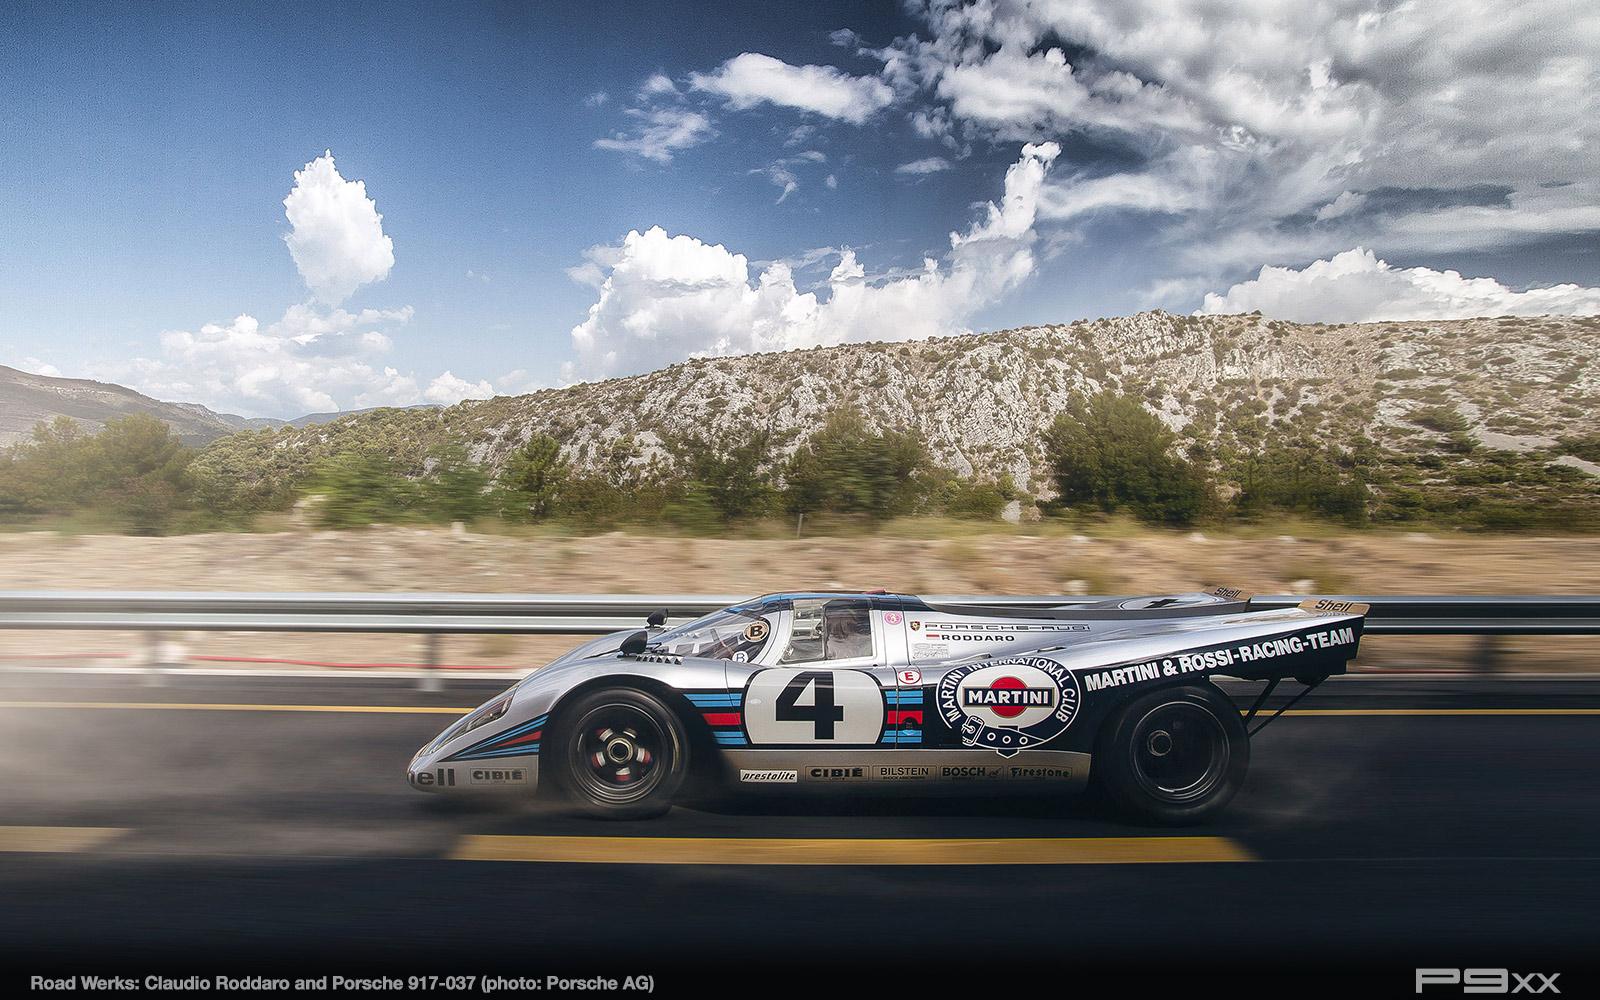 Porsche-917-037-Martini-Racing-Monaco-2018-307